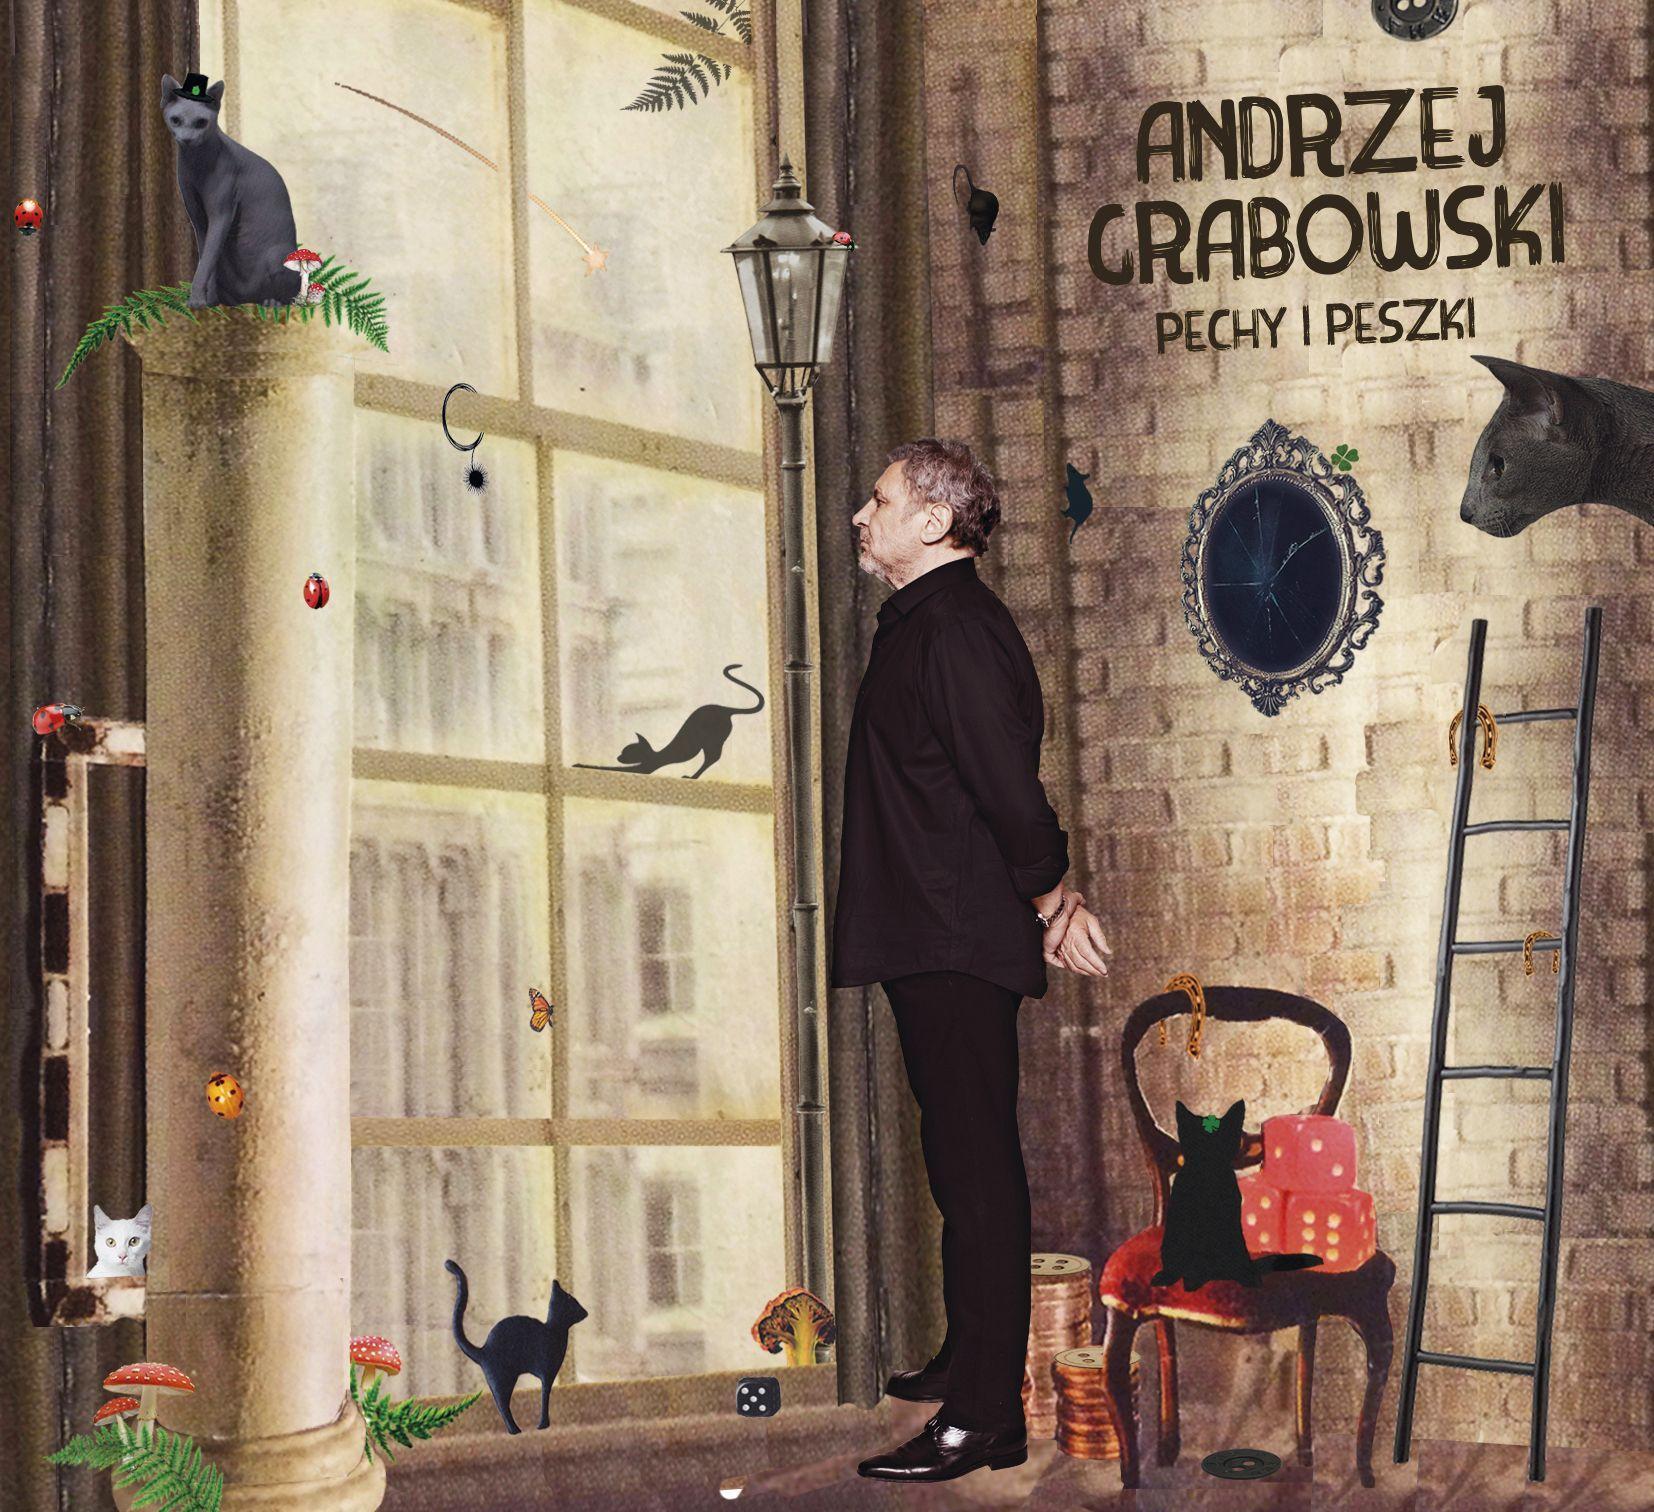 Grabowski Andrzej – Pechy I Peszki